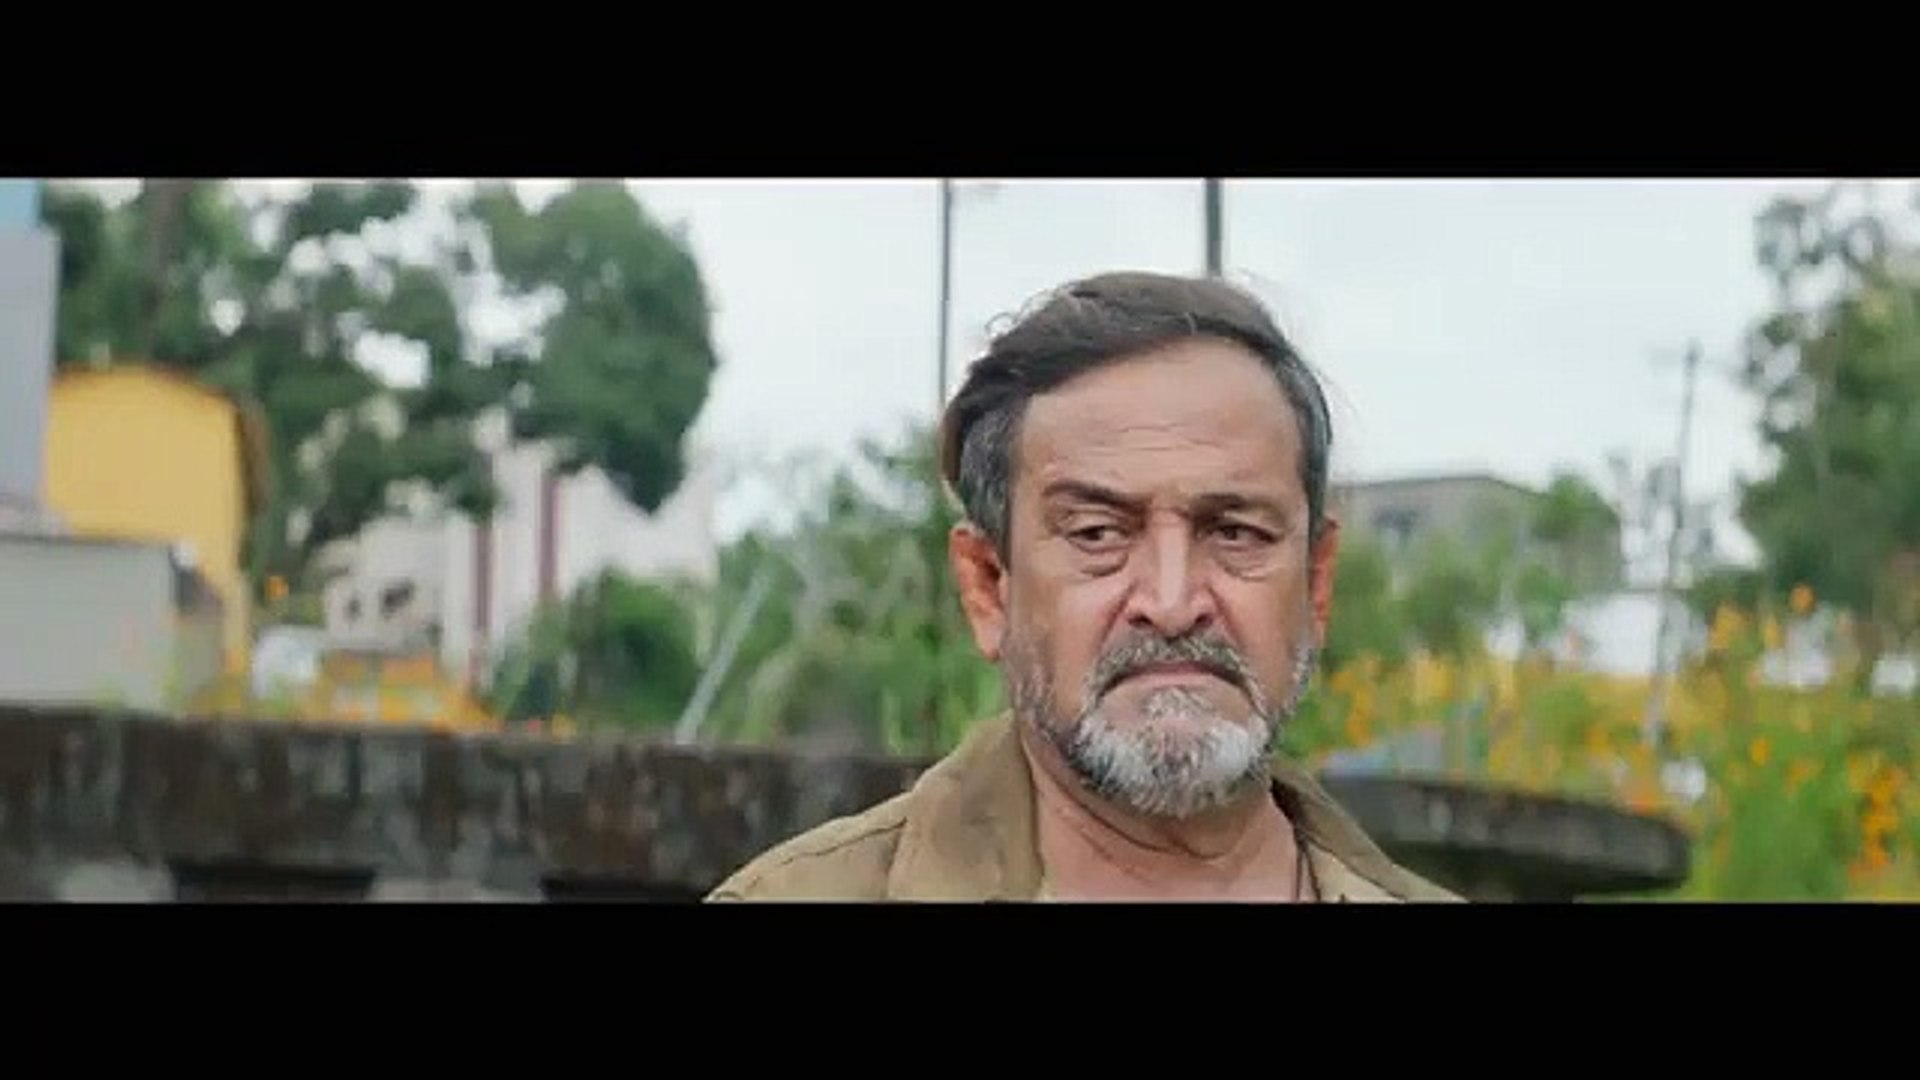 kesari 2020 marathi  movie - atishmkv